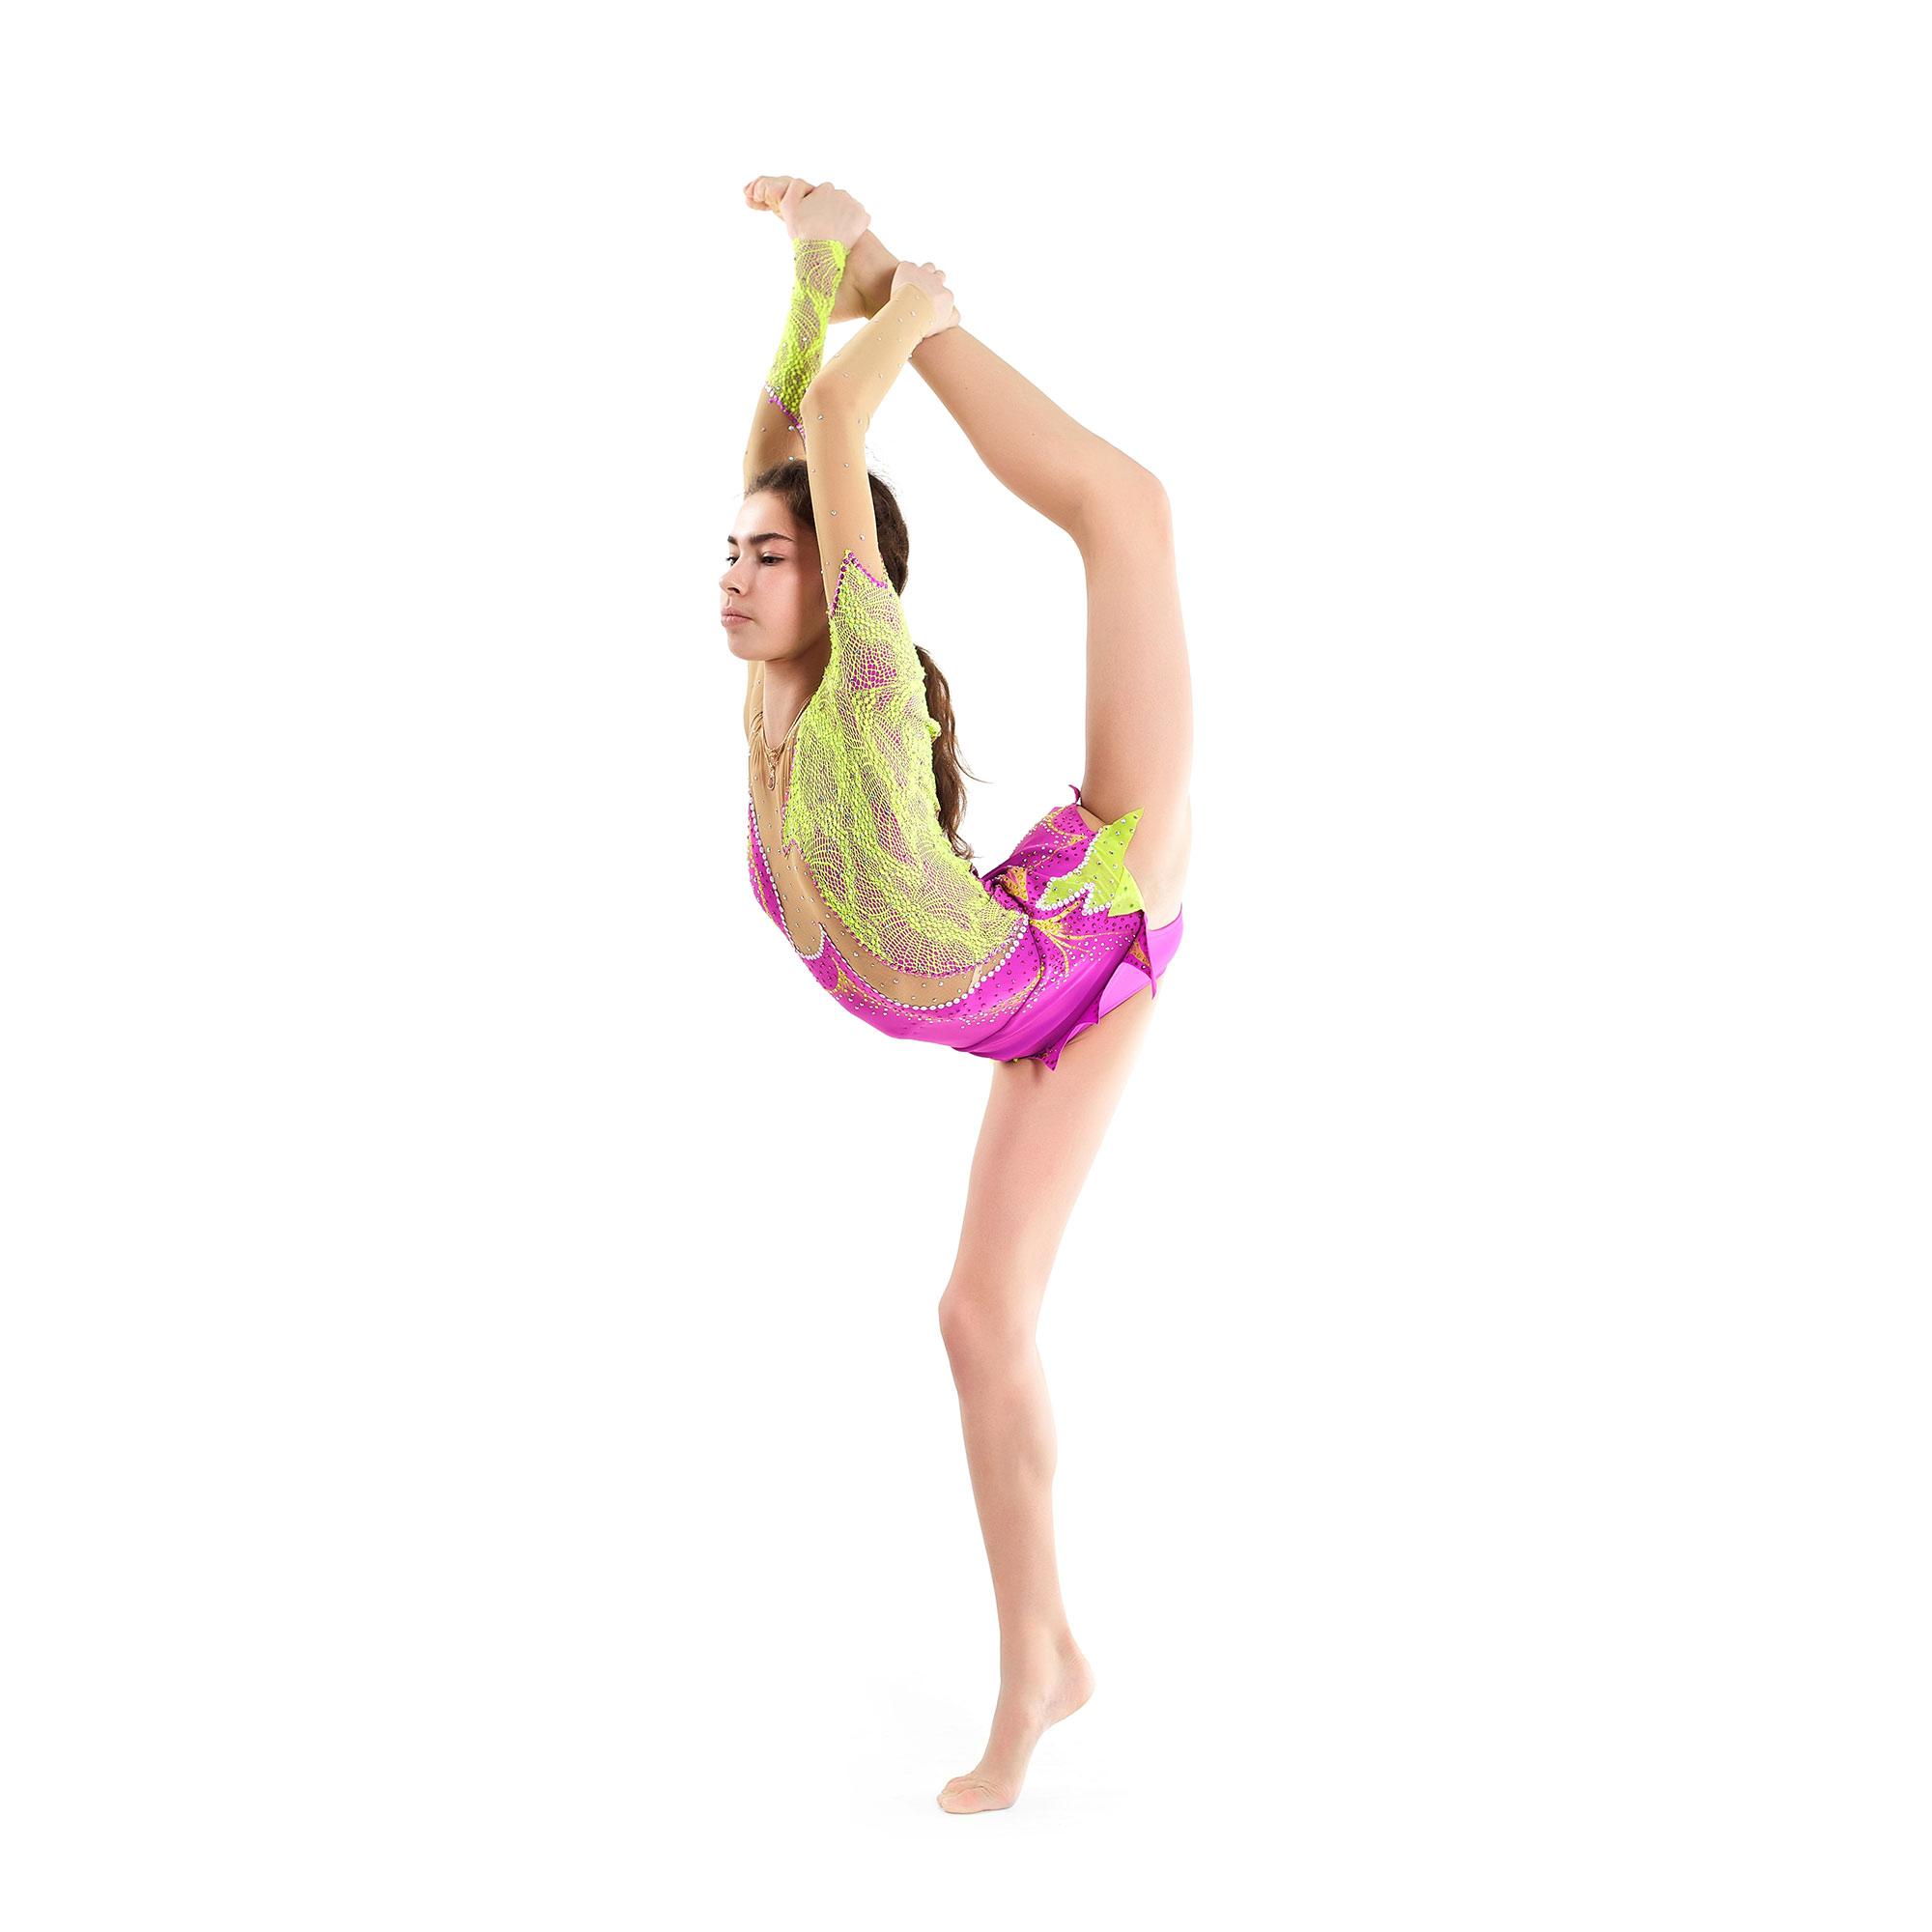 Rhythmic Gymnastics Leotard 47 made in liliac, salad guipure & mesh colors